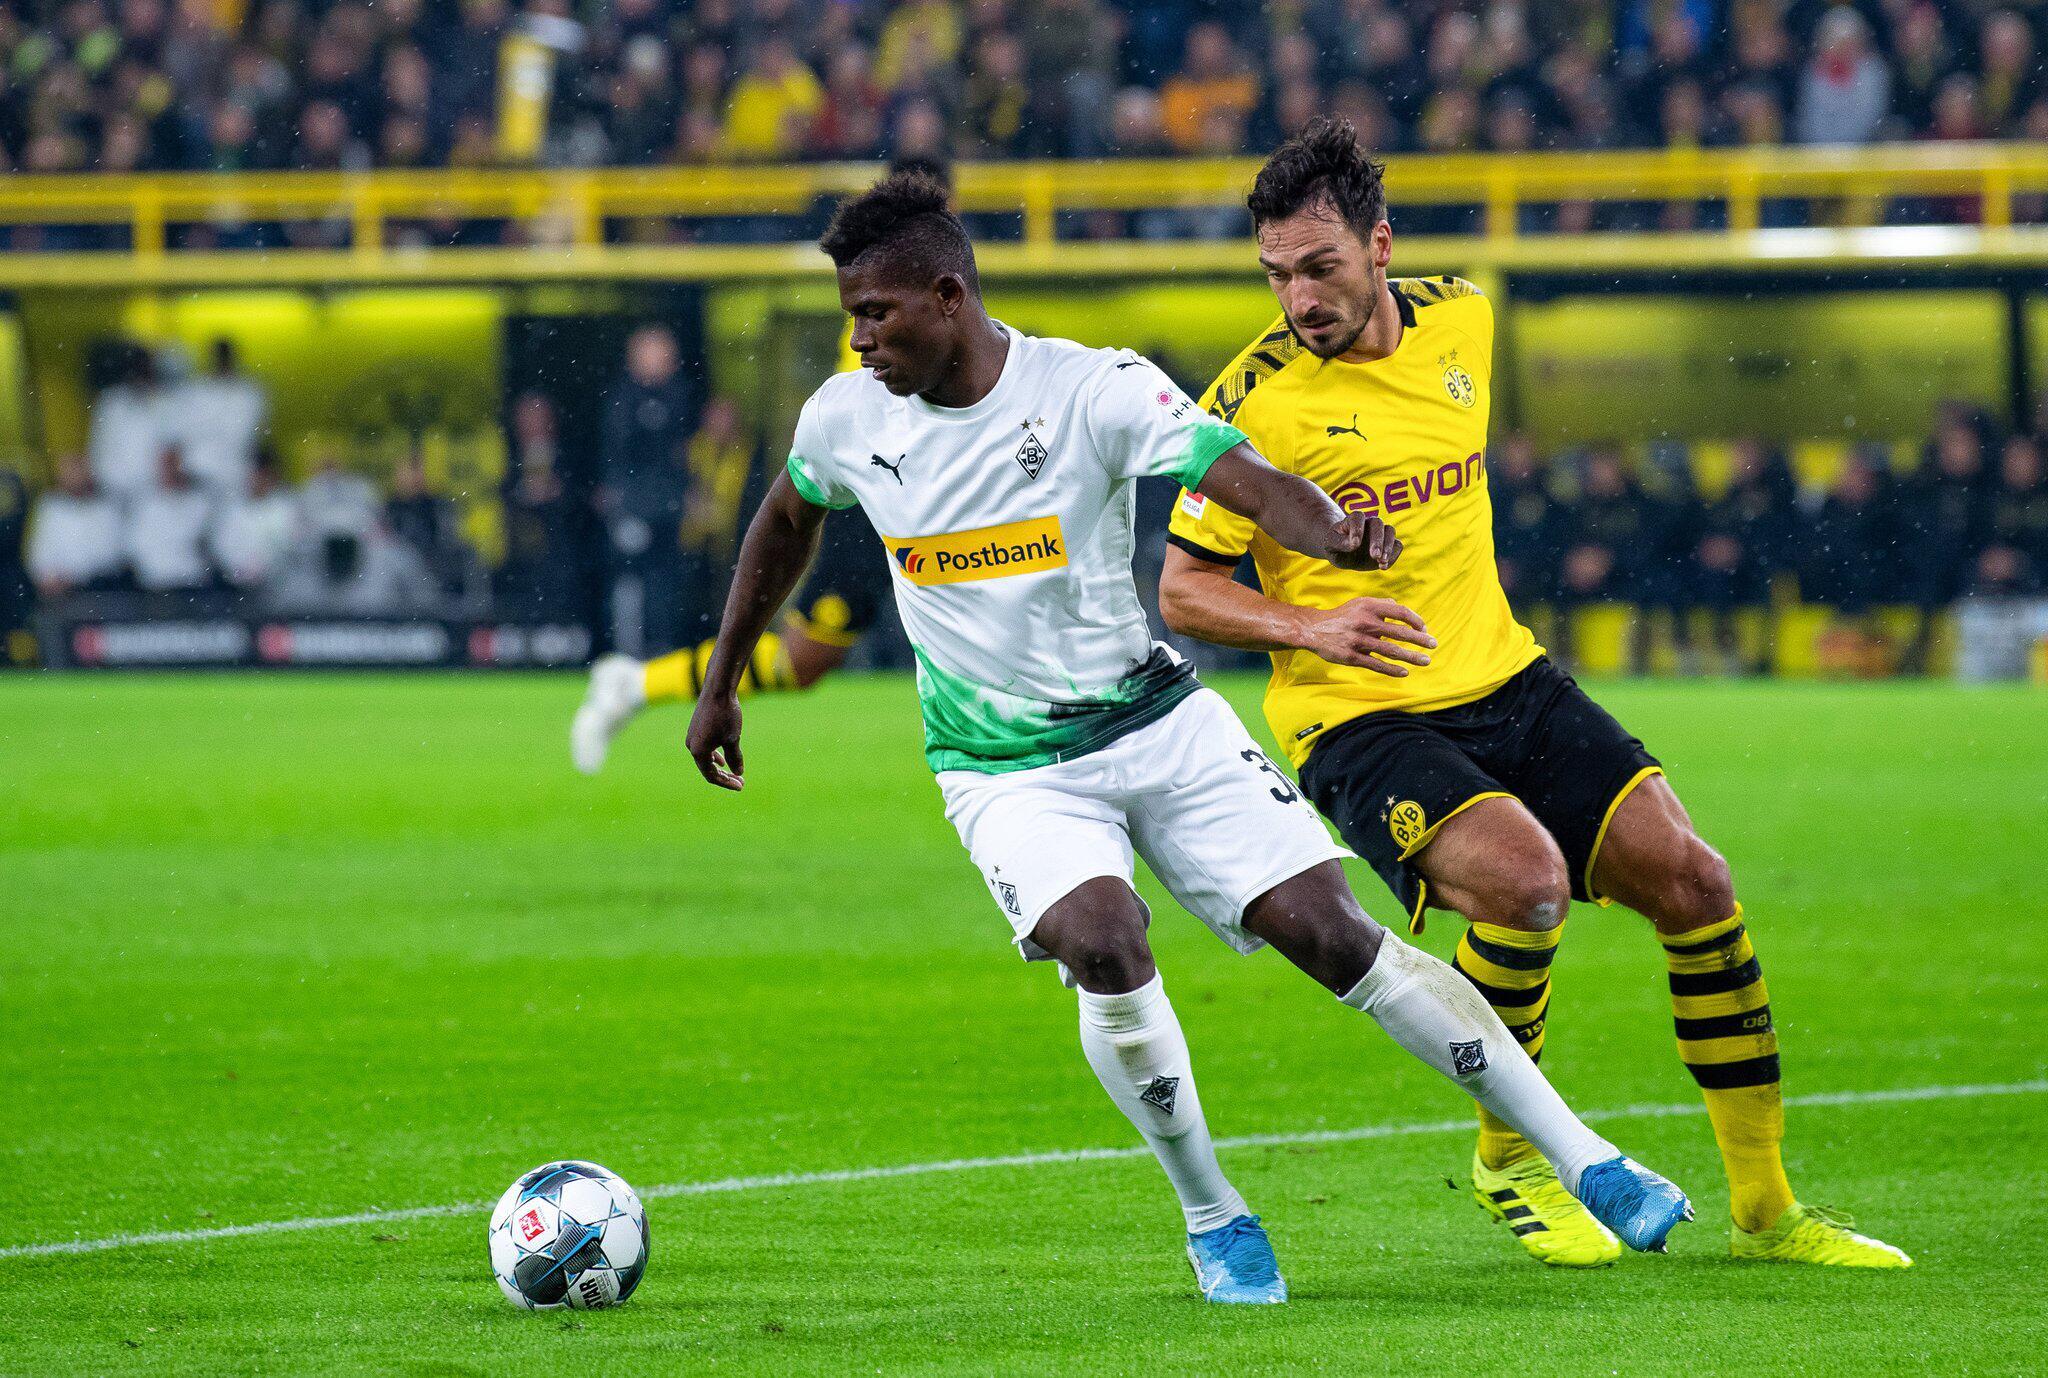 Bild zu Borussia Dortmund - Borussia Mönchengladbach